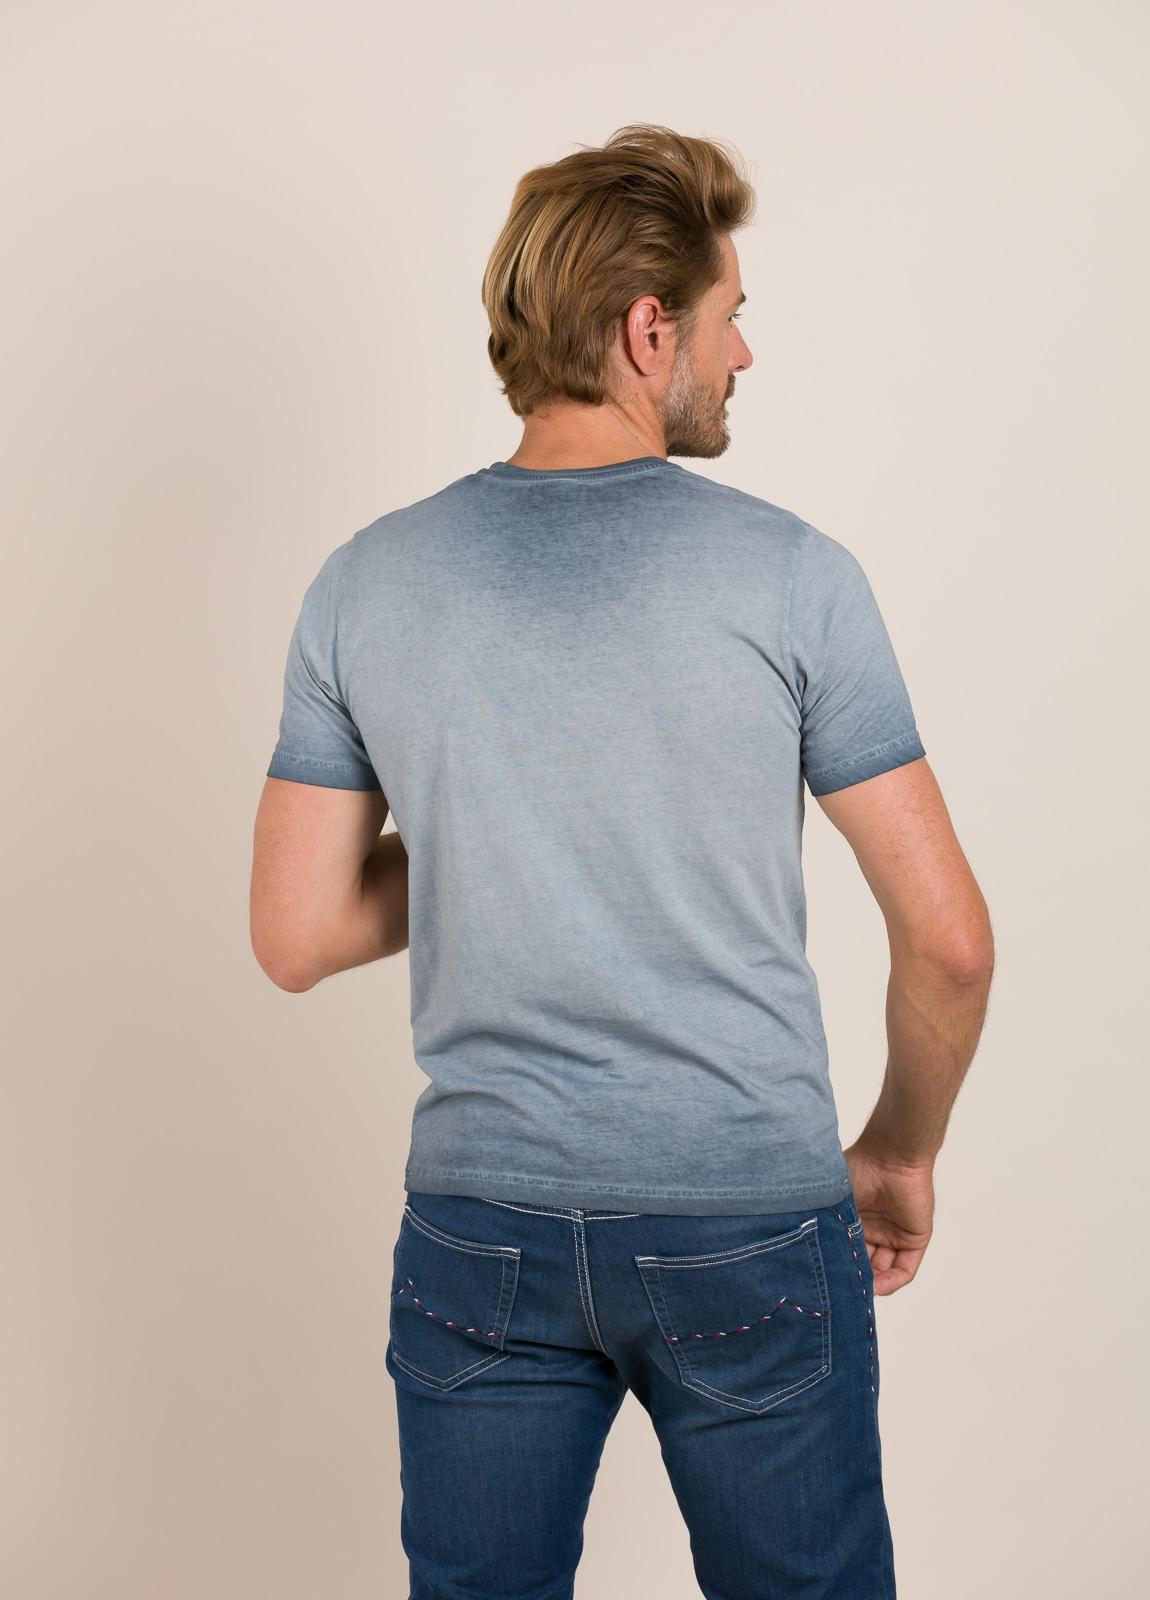 Camiseta BOB estampado vintage azul - Ítem1